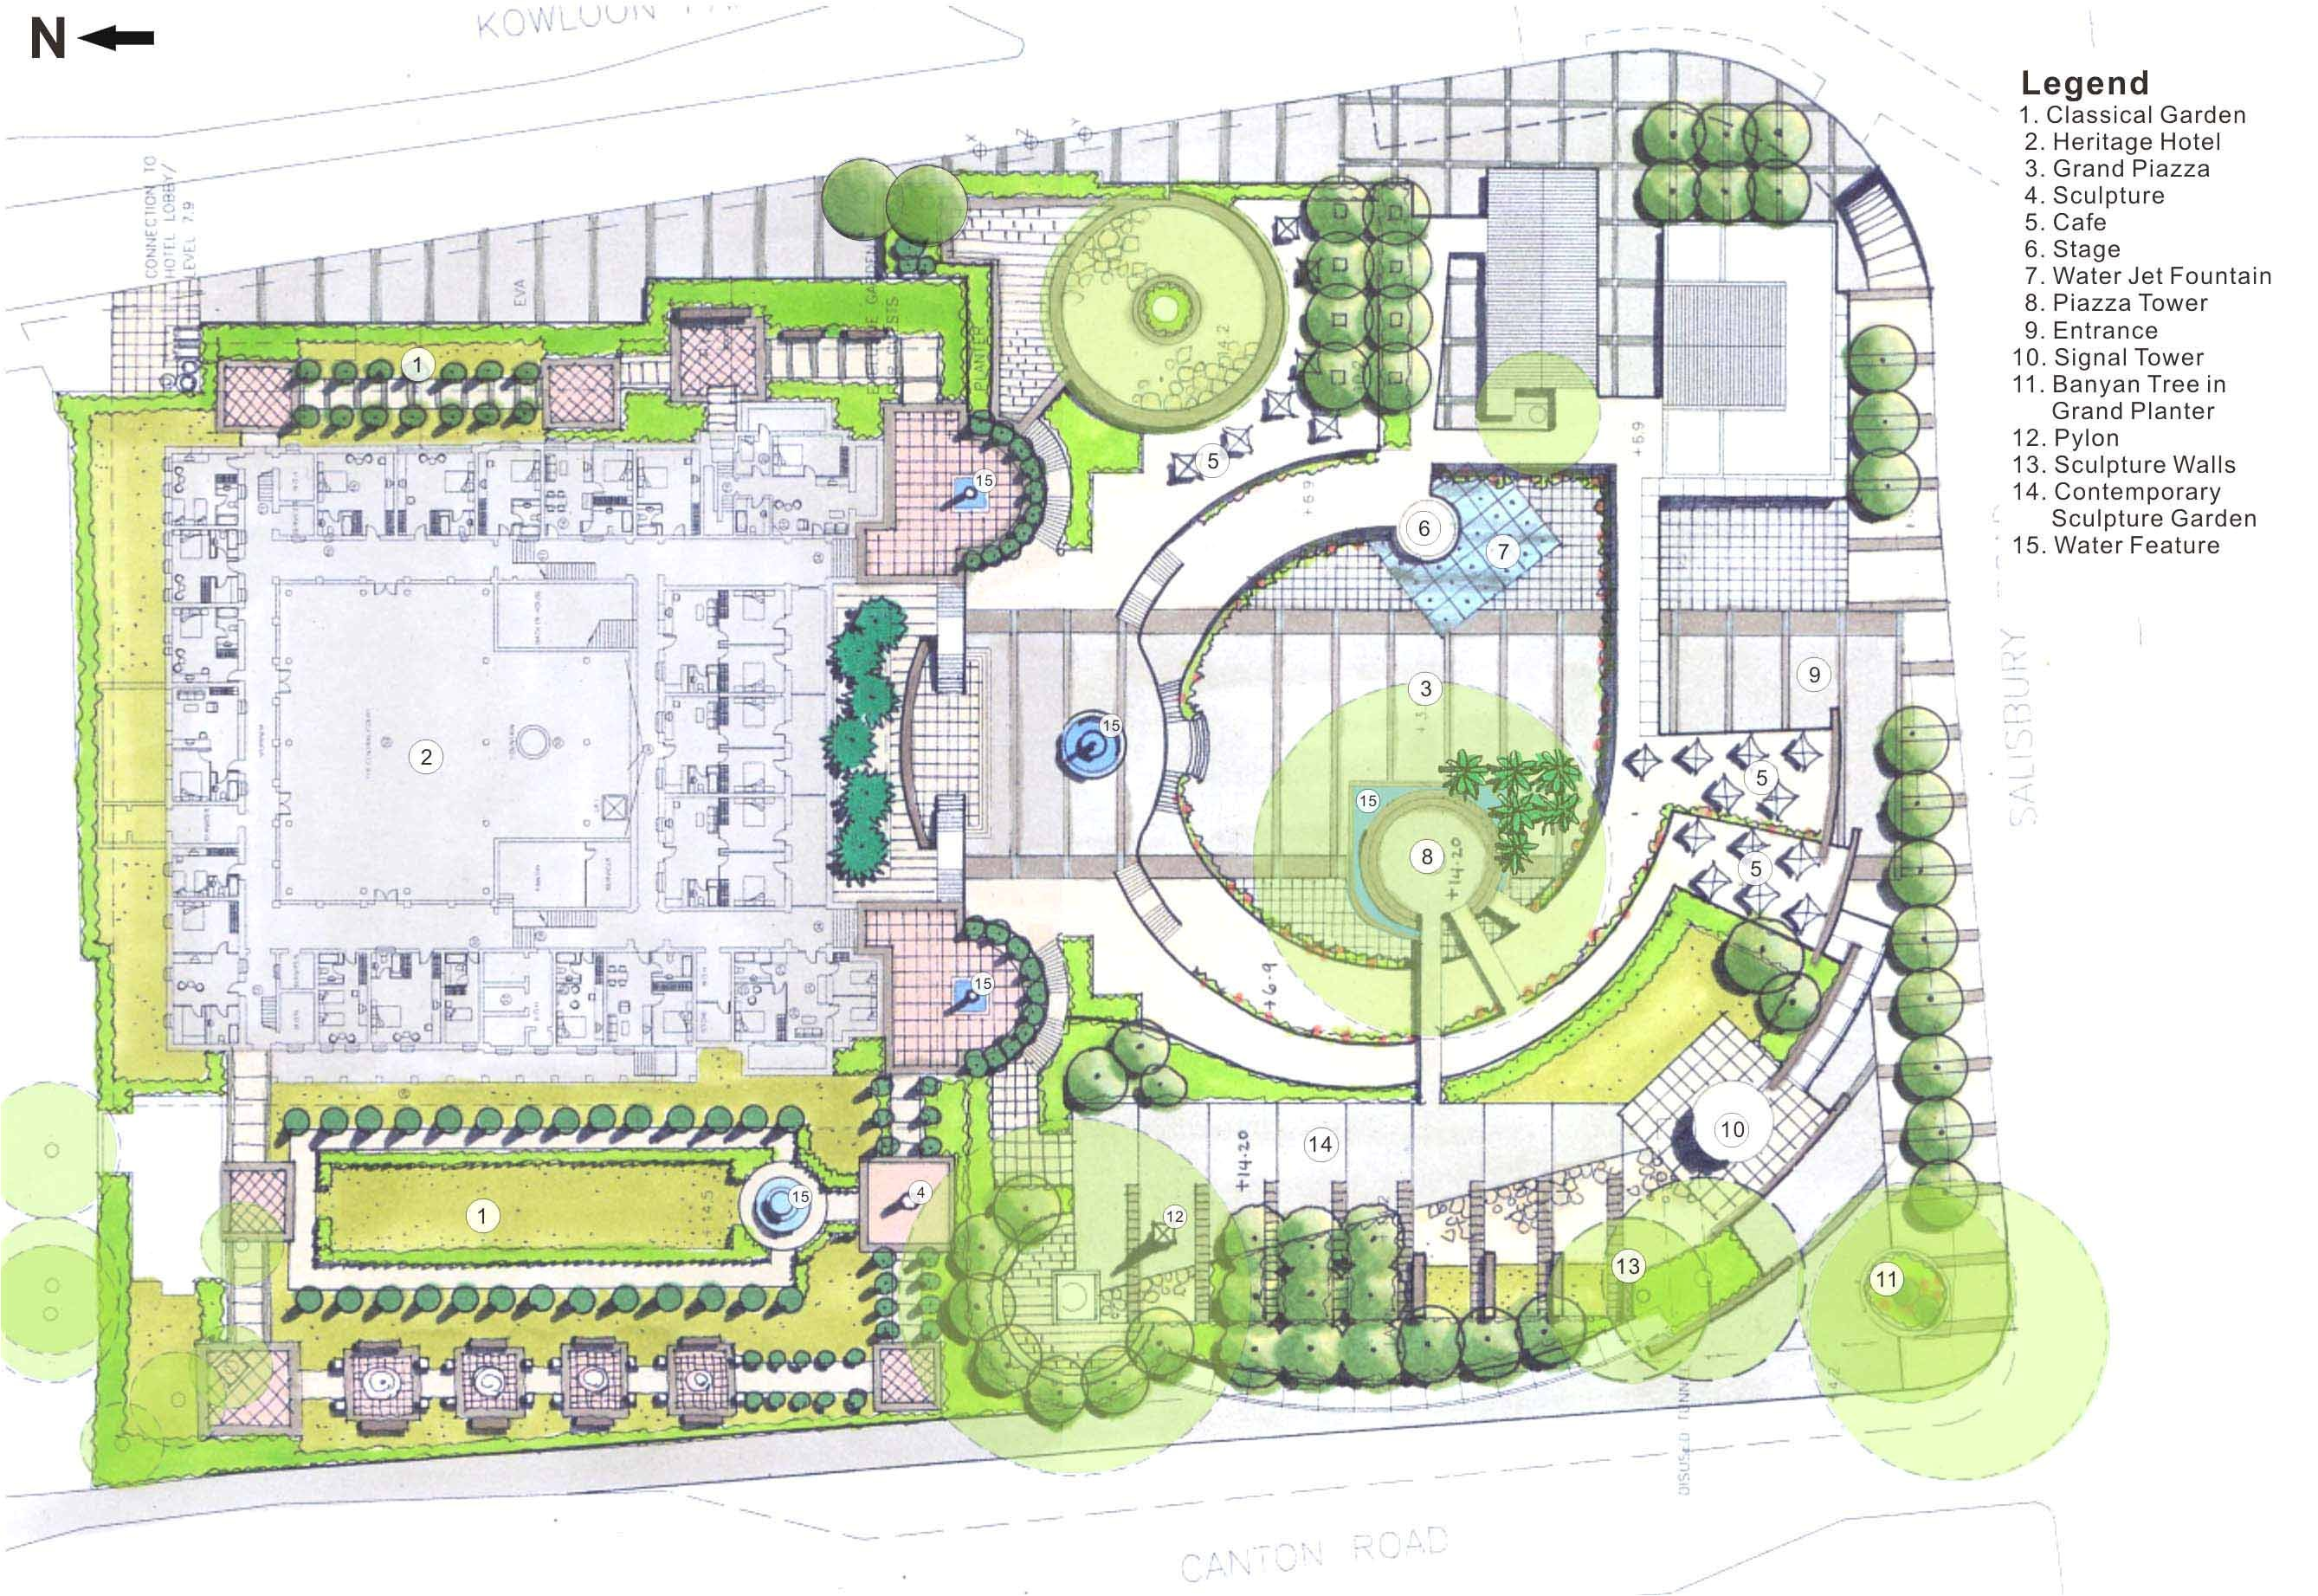 free garden planning software peaceful ideas kitchen planner astonishing vegetable layout pleasurable lovely knot landscape design plans figure trends